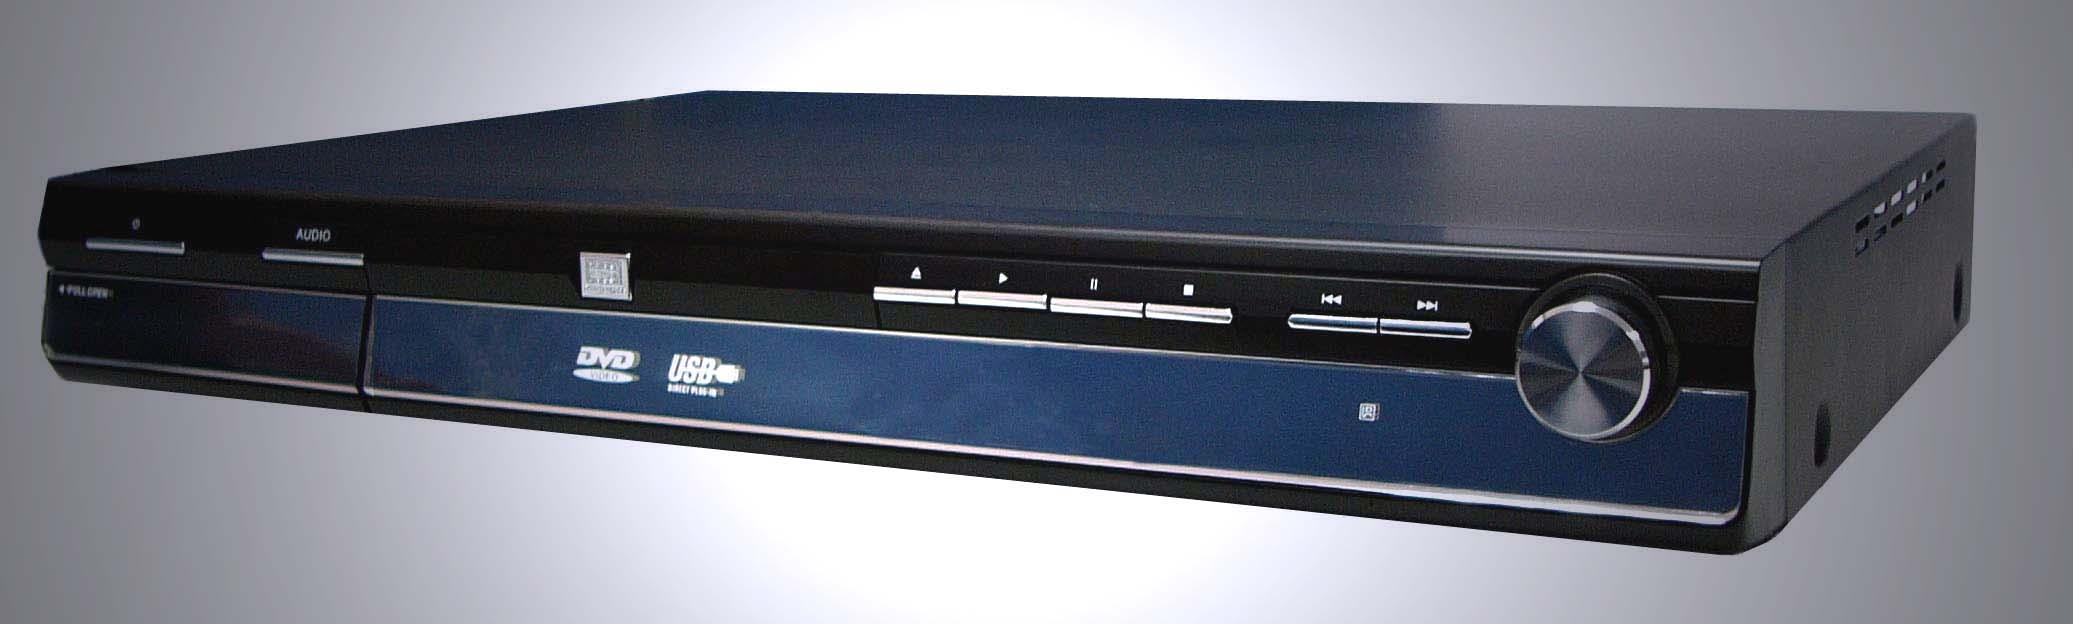 DVD一體化數字家庭影院1